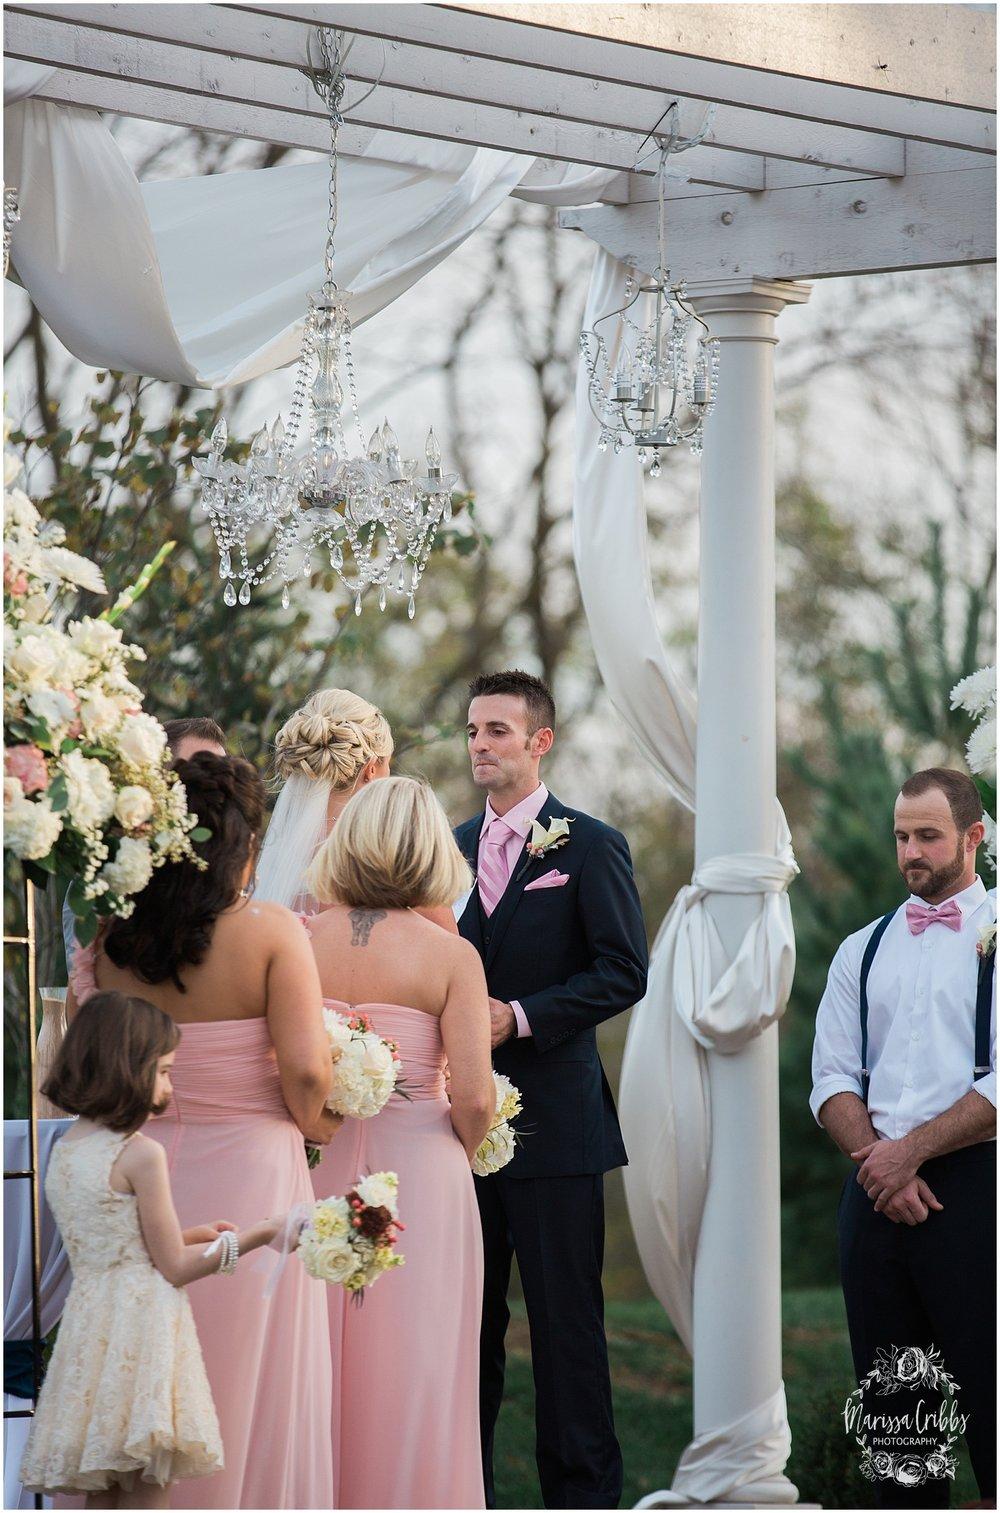 Alex & Amie | Eighteen Ninety Event Space | Marissa Cribbs Photography | Kansas City Perfect Wedding Guide_1345.jpg